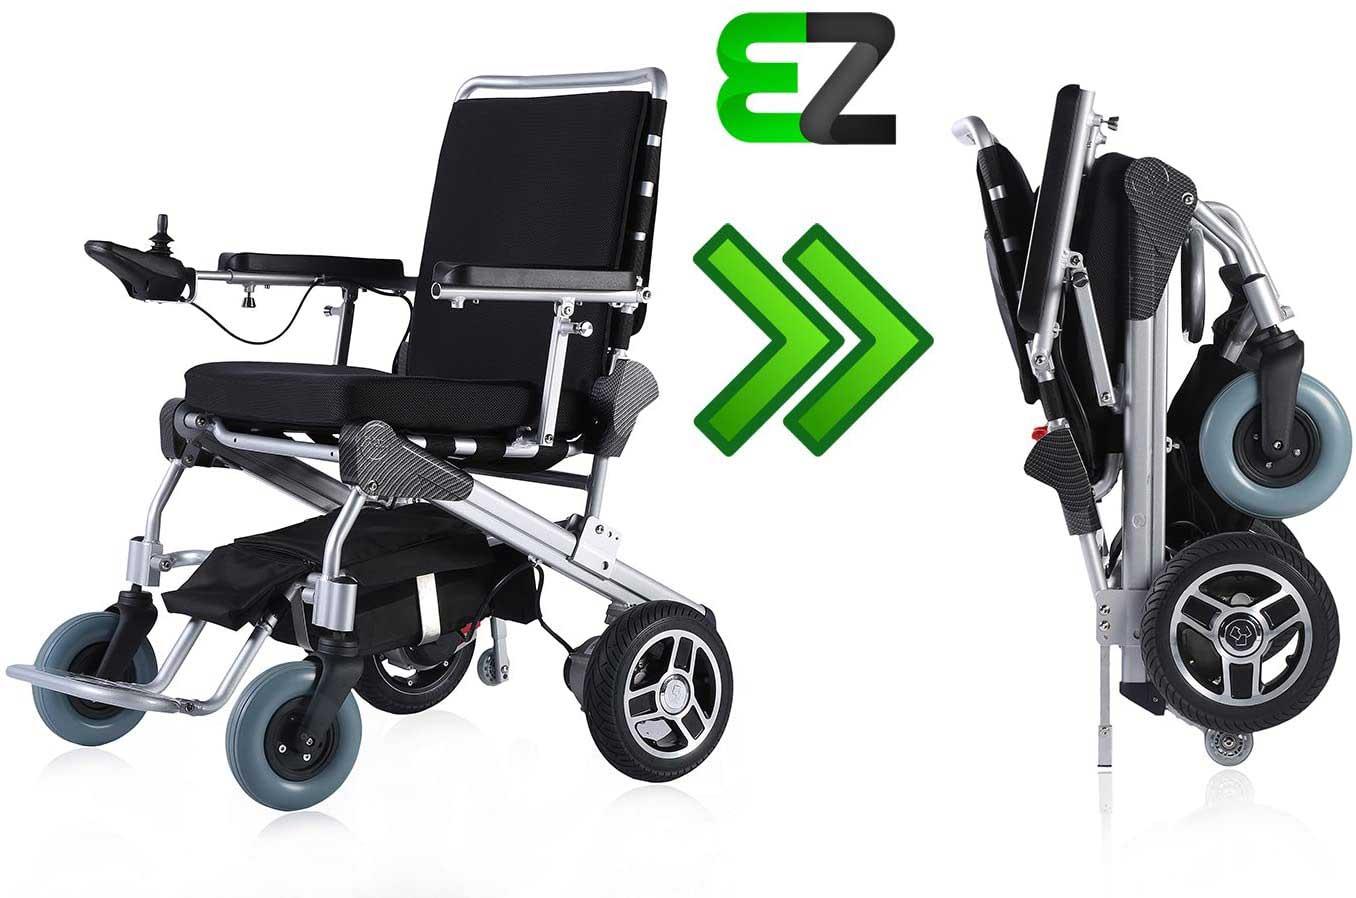 2.2. EZ Lite Cruiser Deluxe Electric Wheelchair